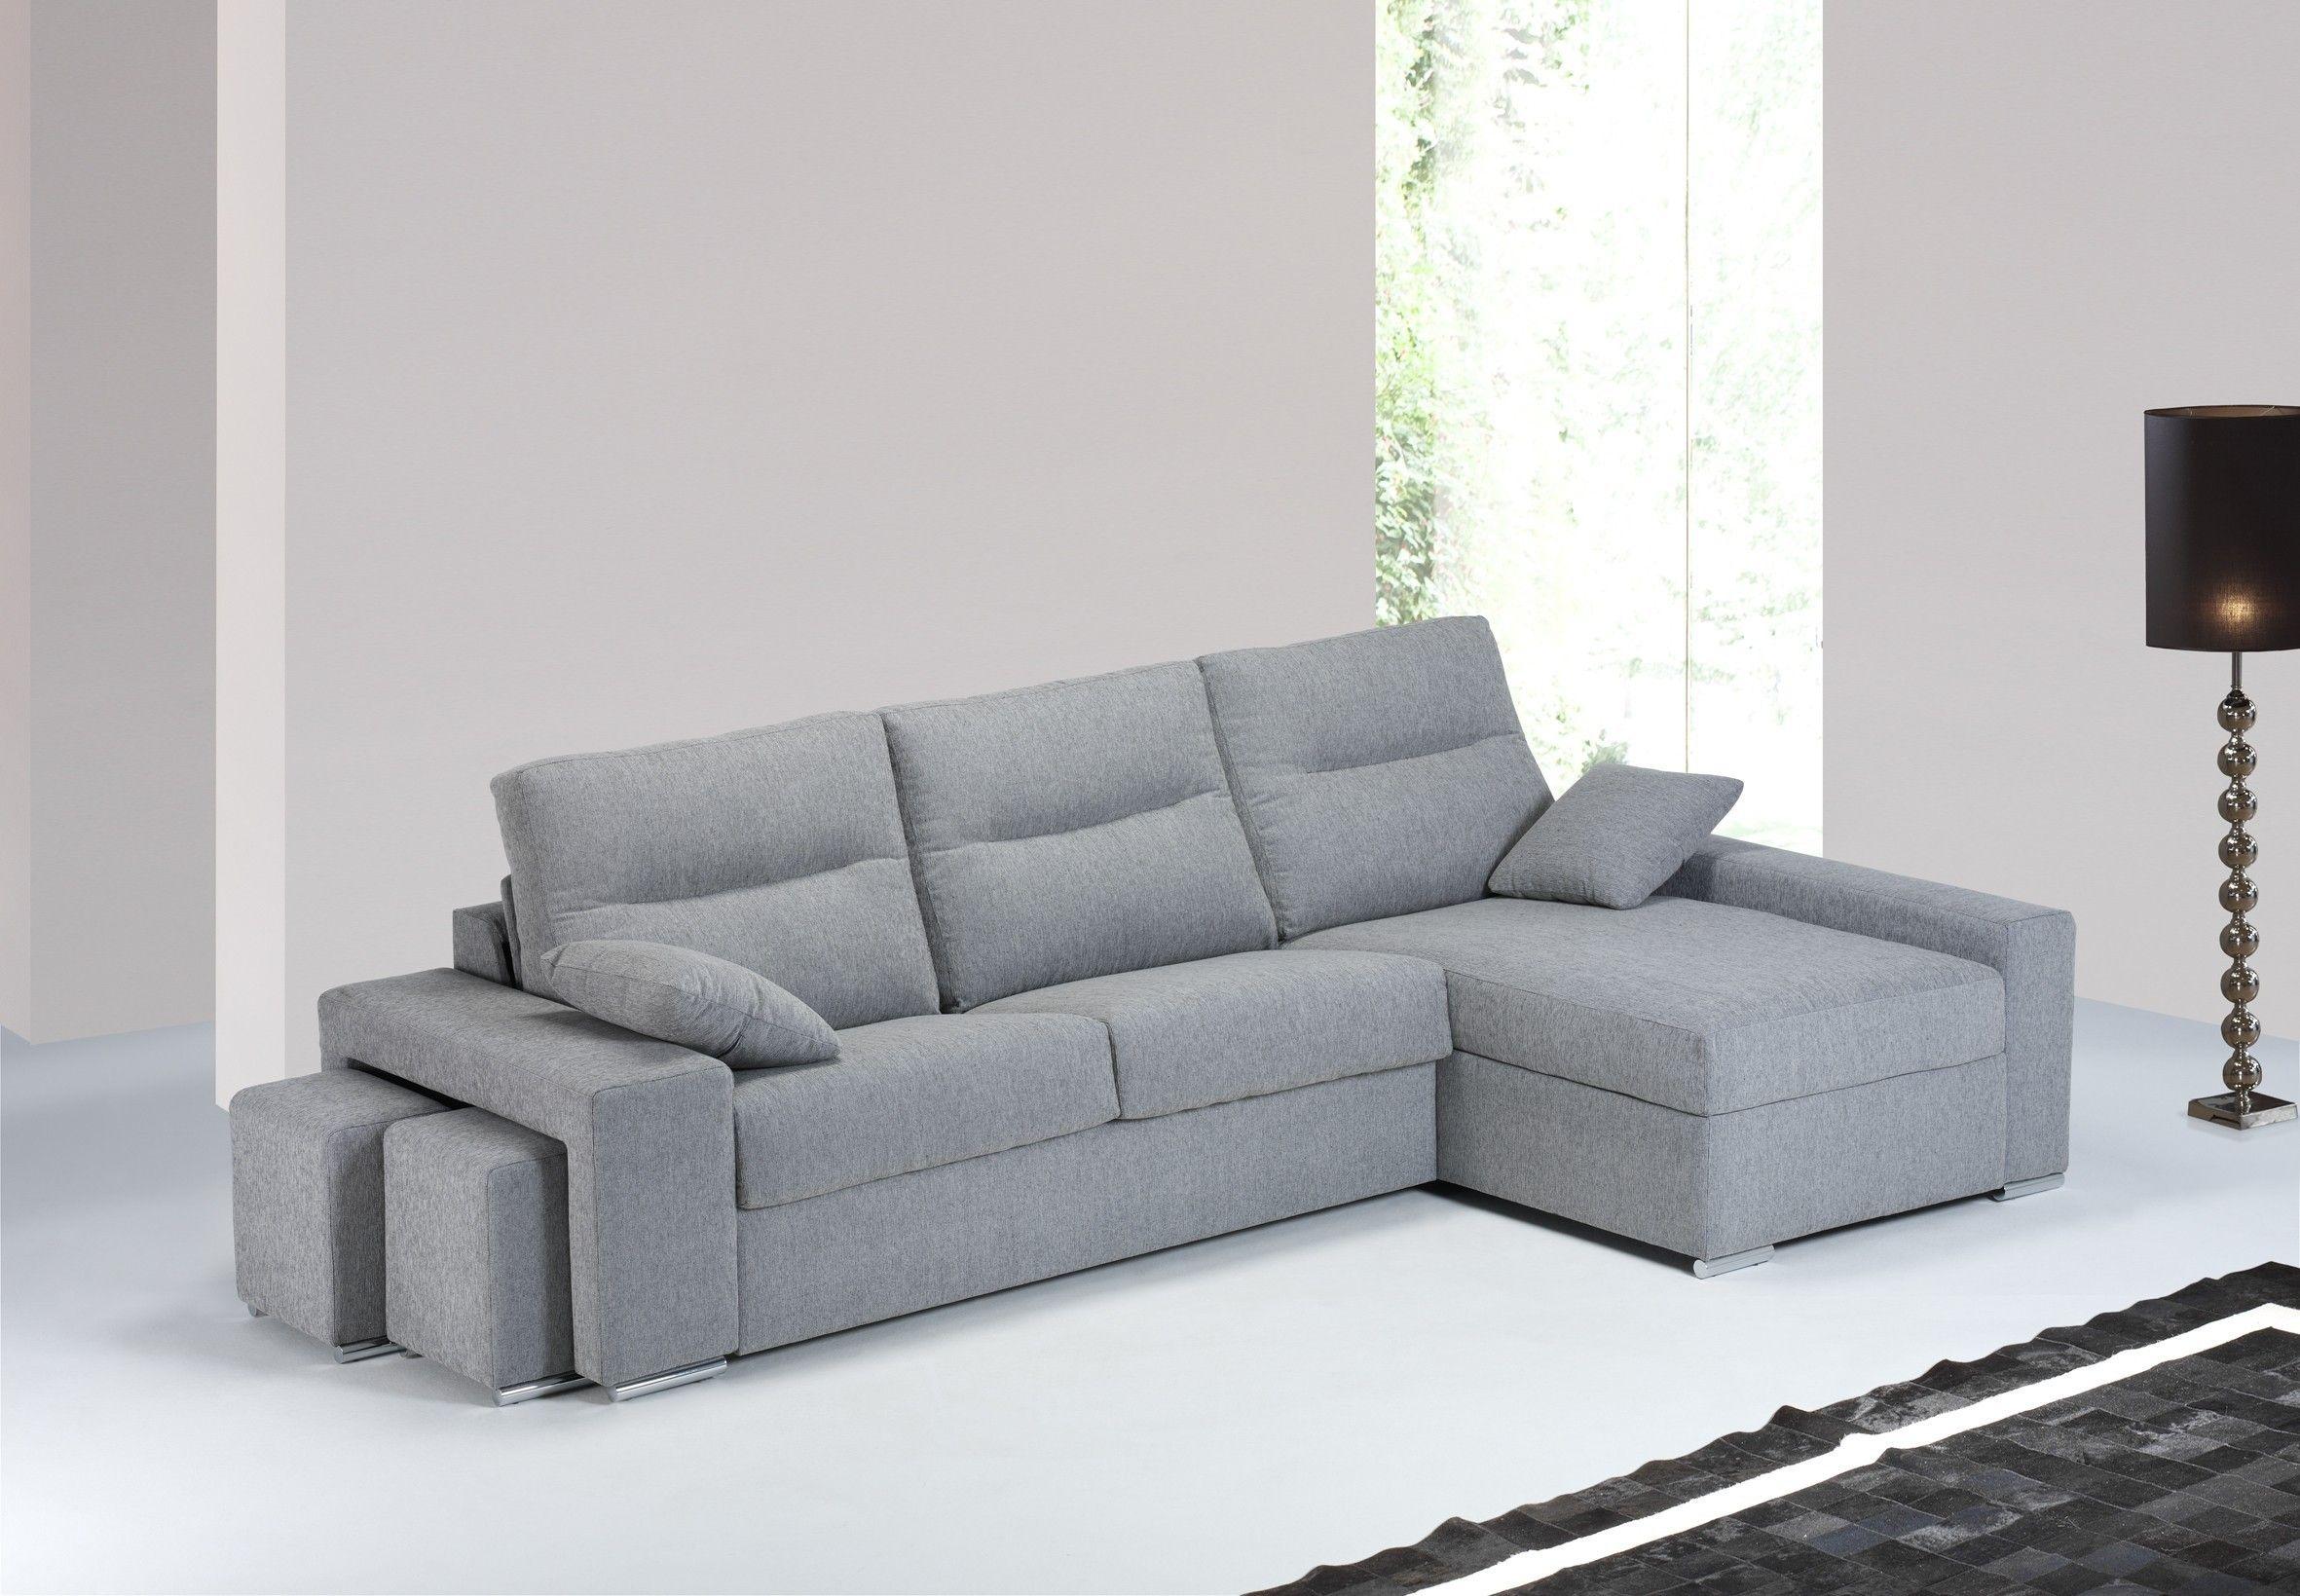 canap convertible couchage quotidien meilleur de canap convertible d angle conde couchage. Black Bedroom Furniture Sets. Home Design Ideas